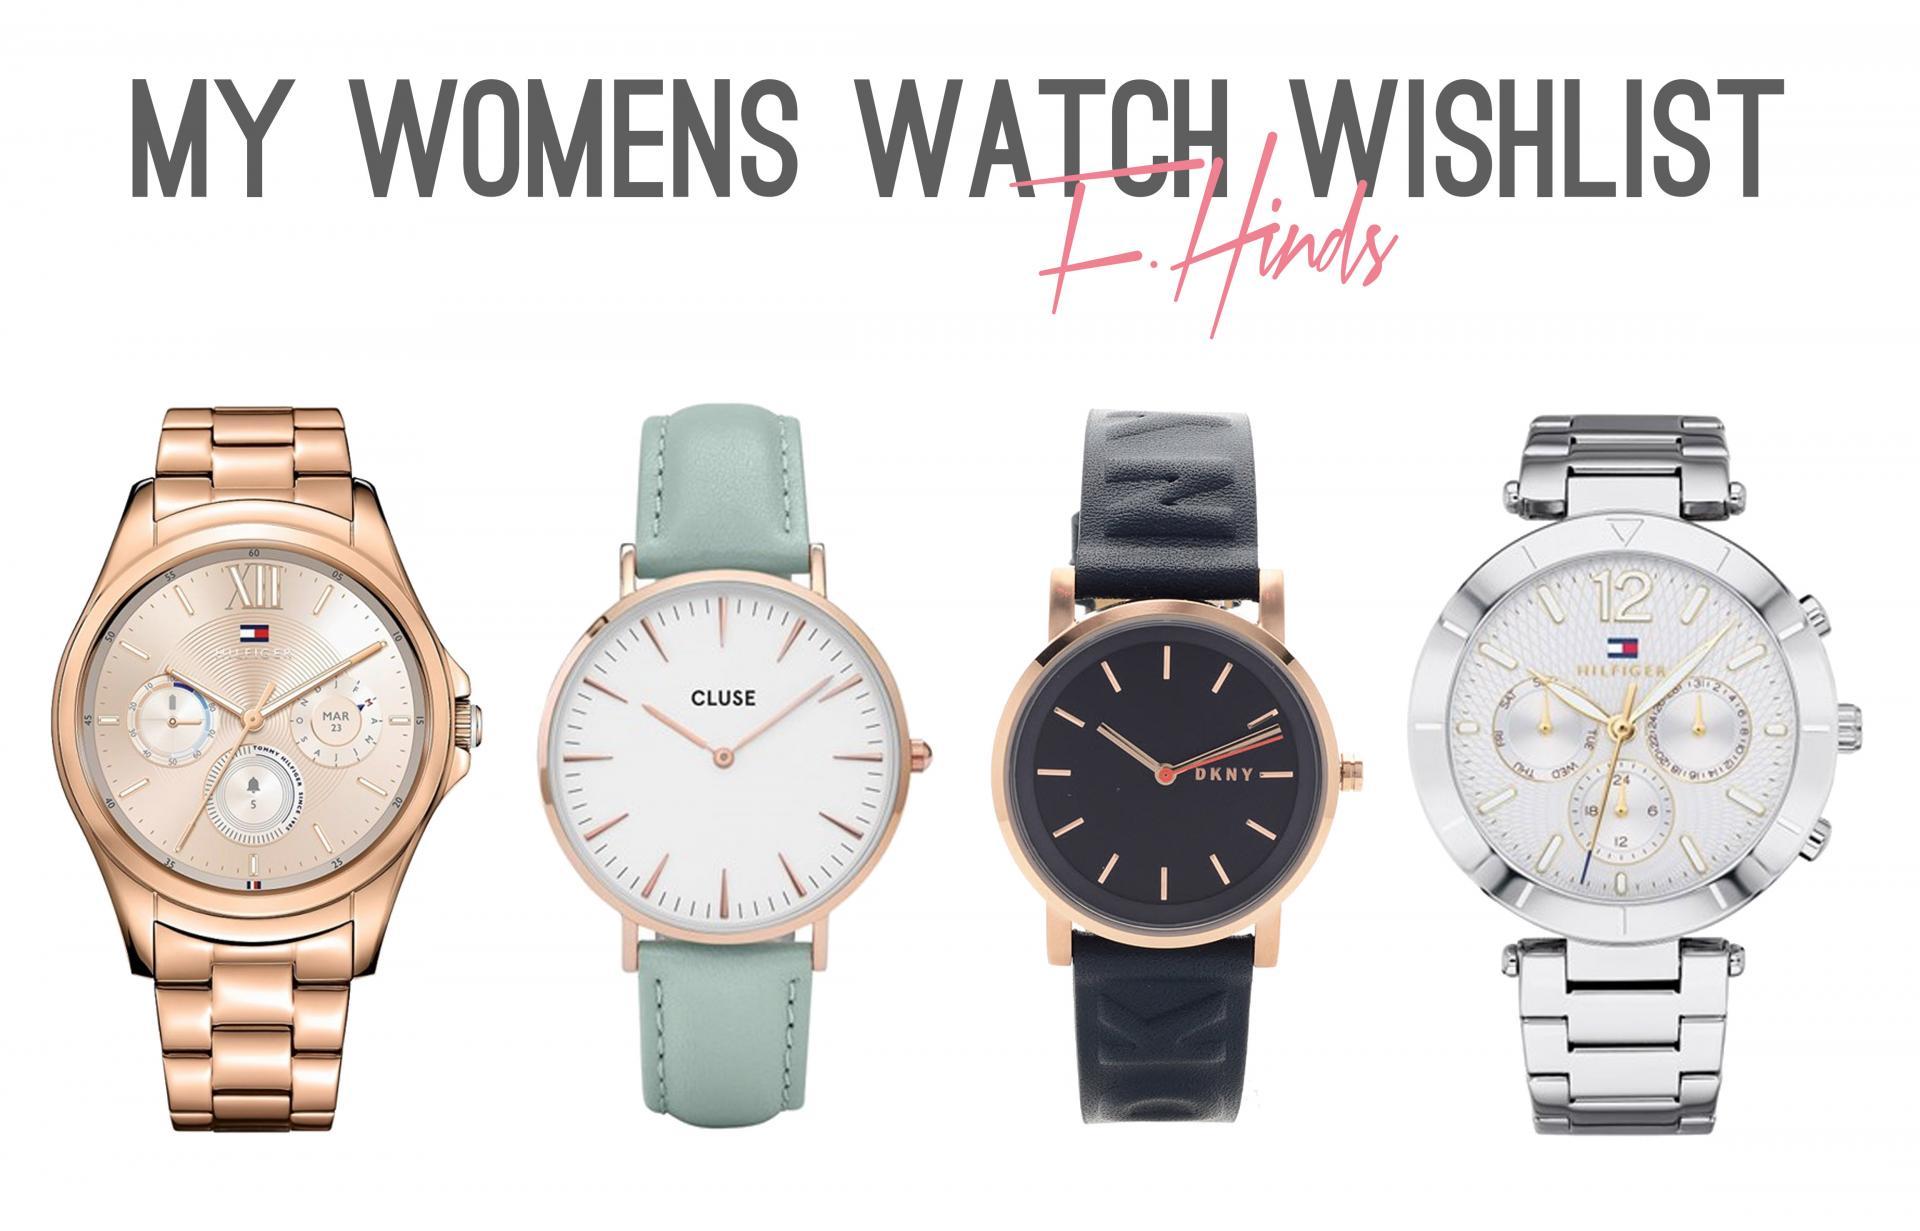 My Woman's Watch Wishlist with F.hinds Jewellers - Rachel Nicole UK Blogger